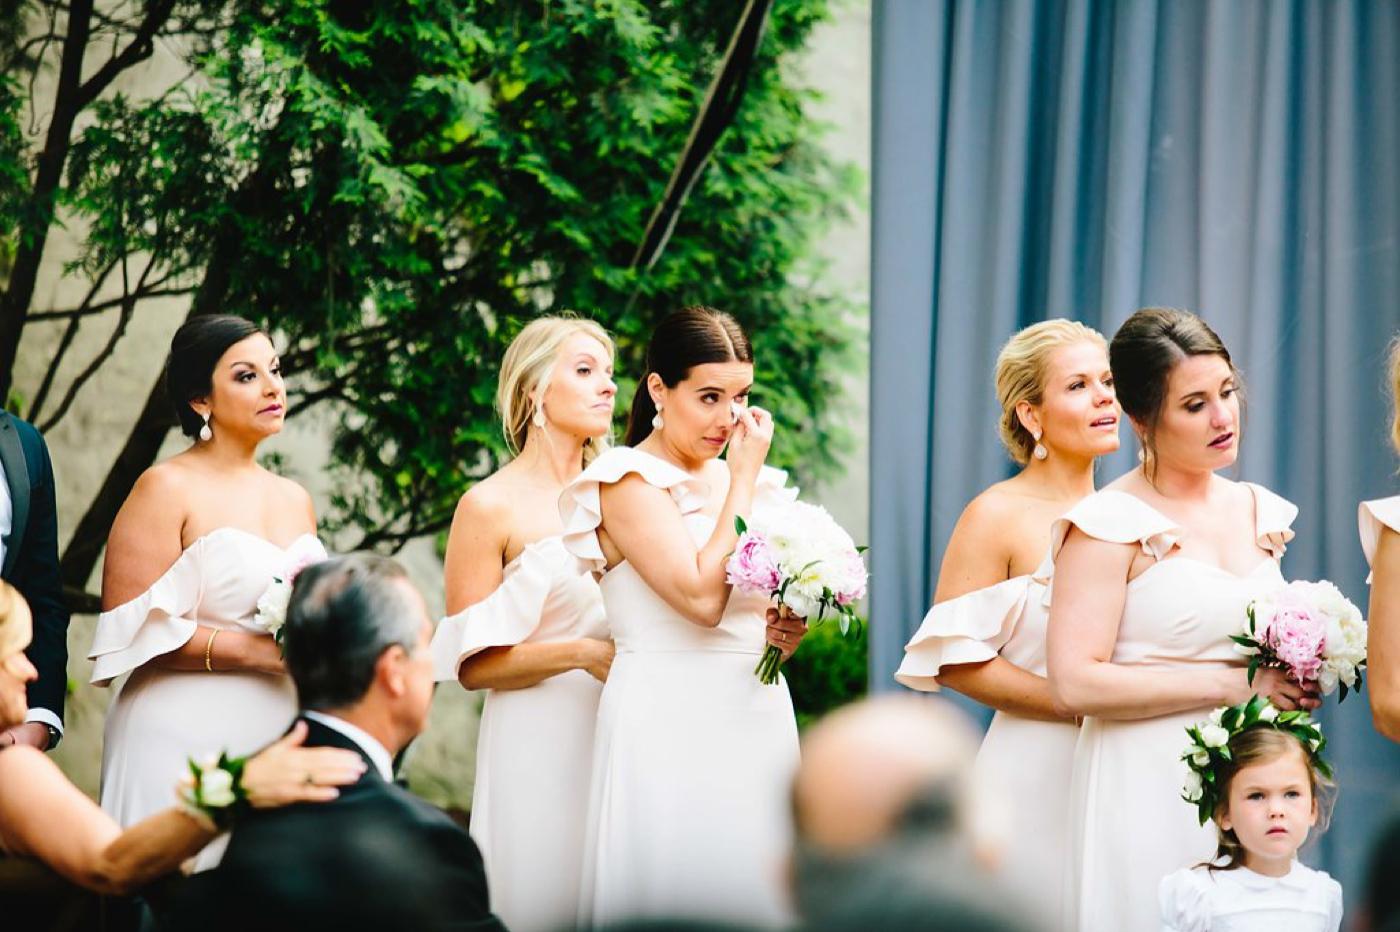 chicago-fine-art-wedding-photography-sakamuri56